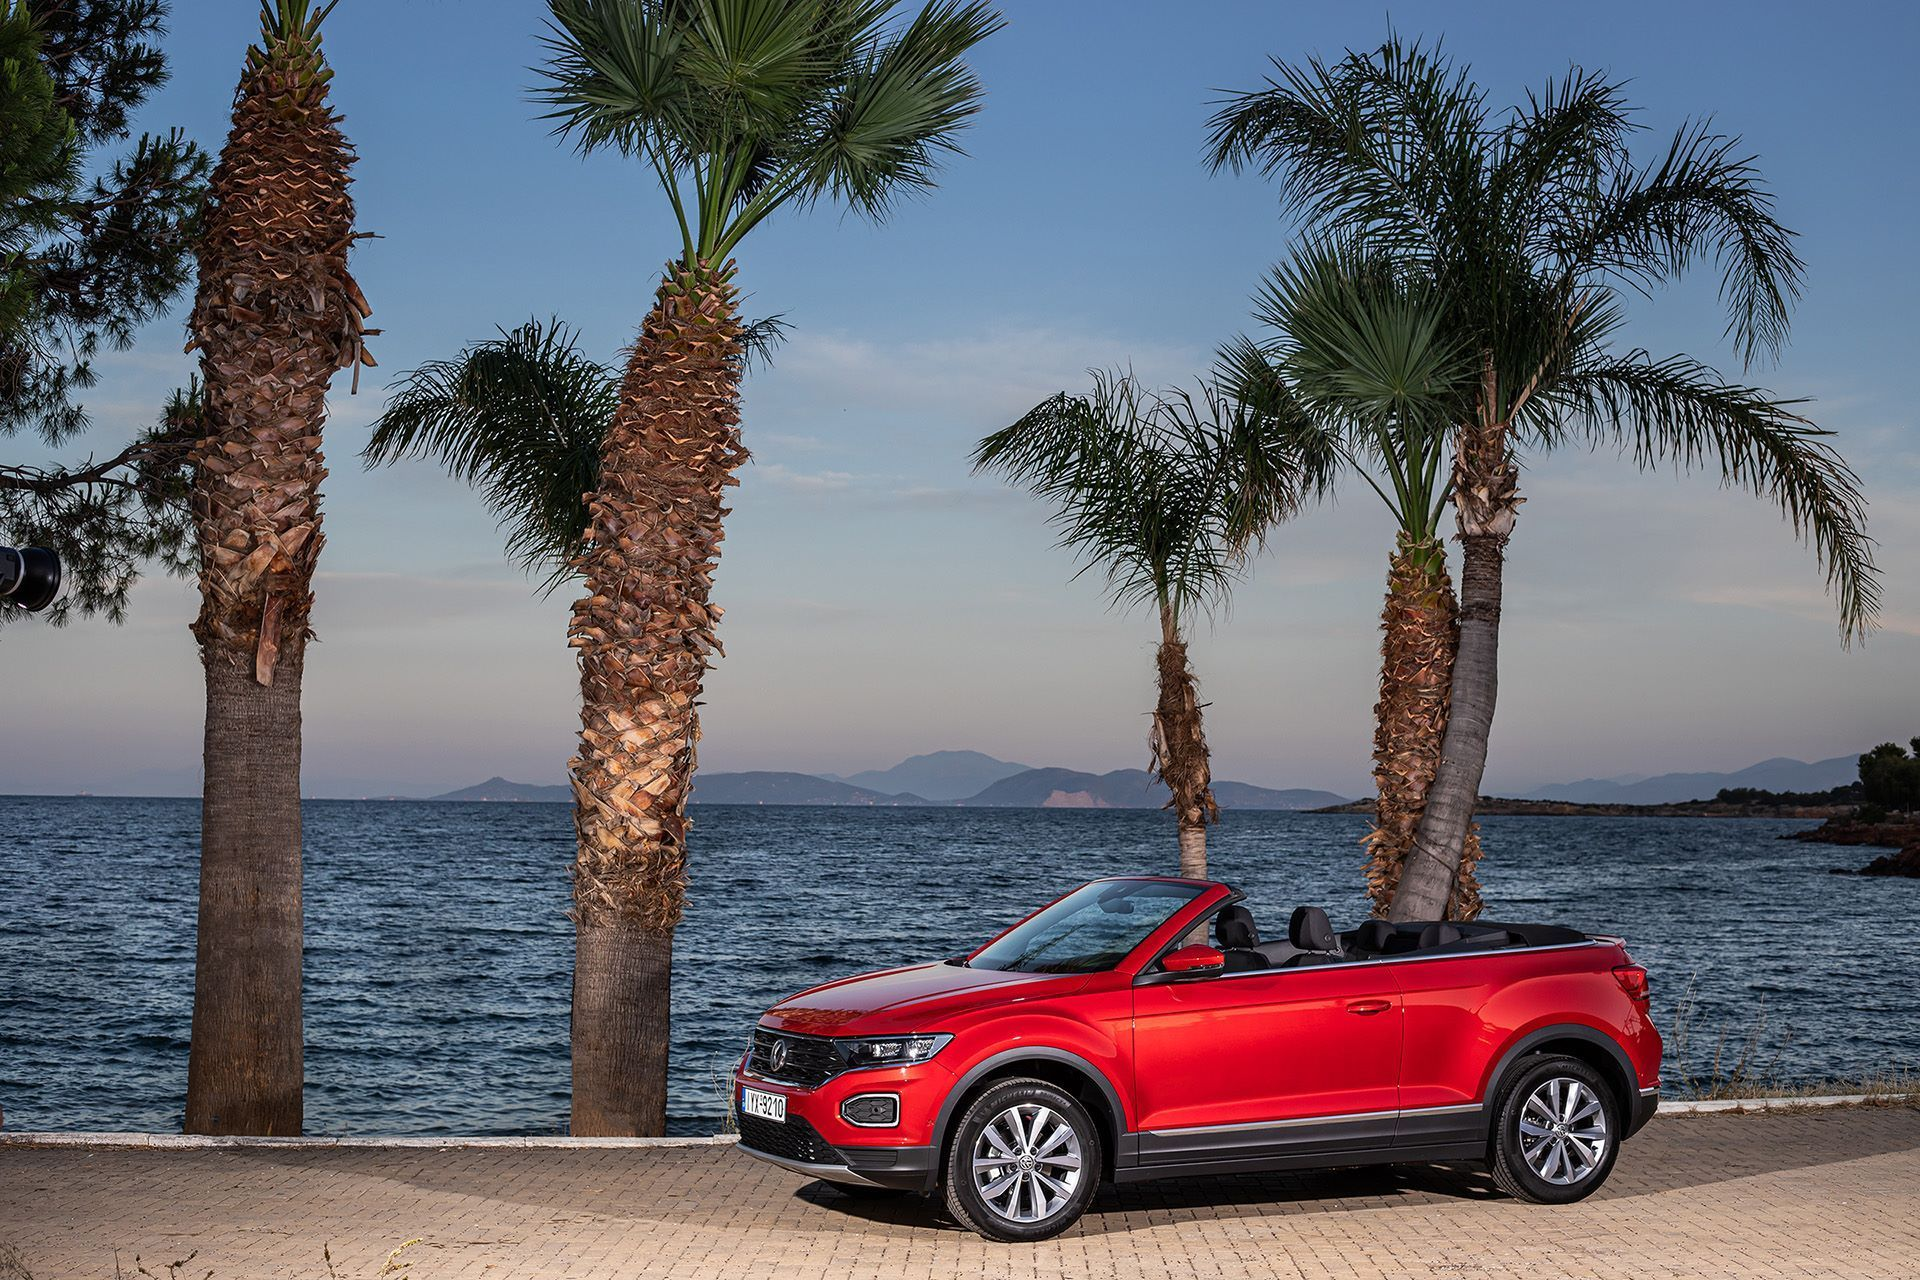 Volkswagen-T-Roc-Cabriolet-Greece-53